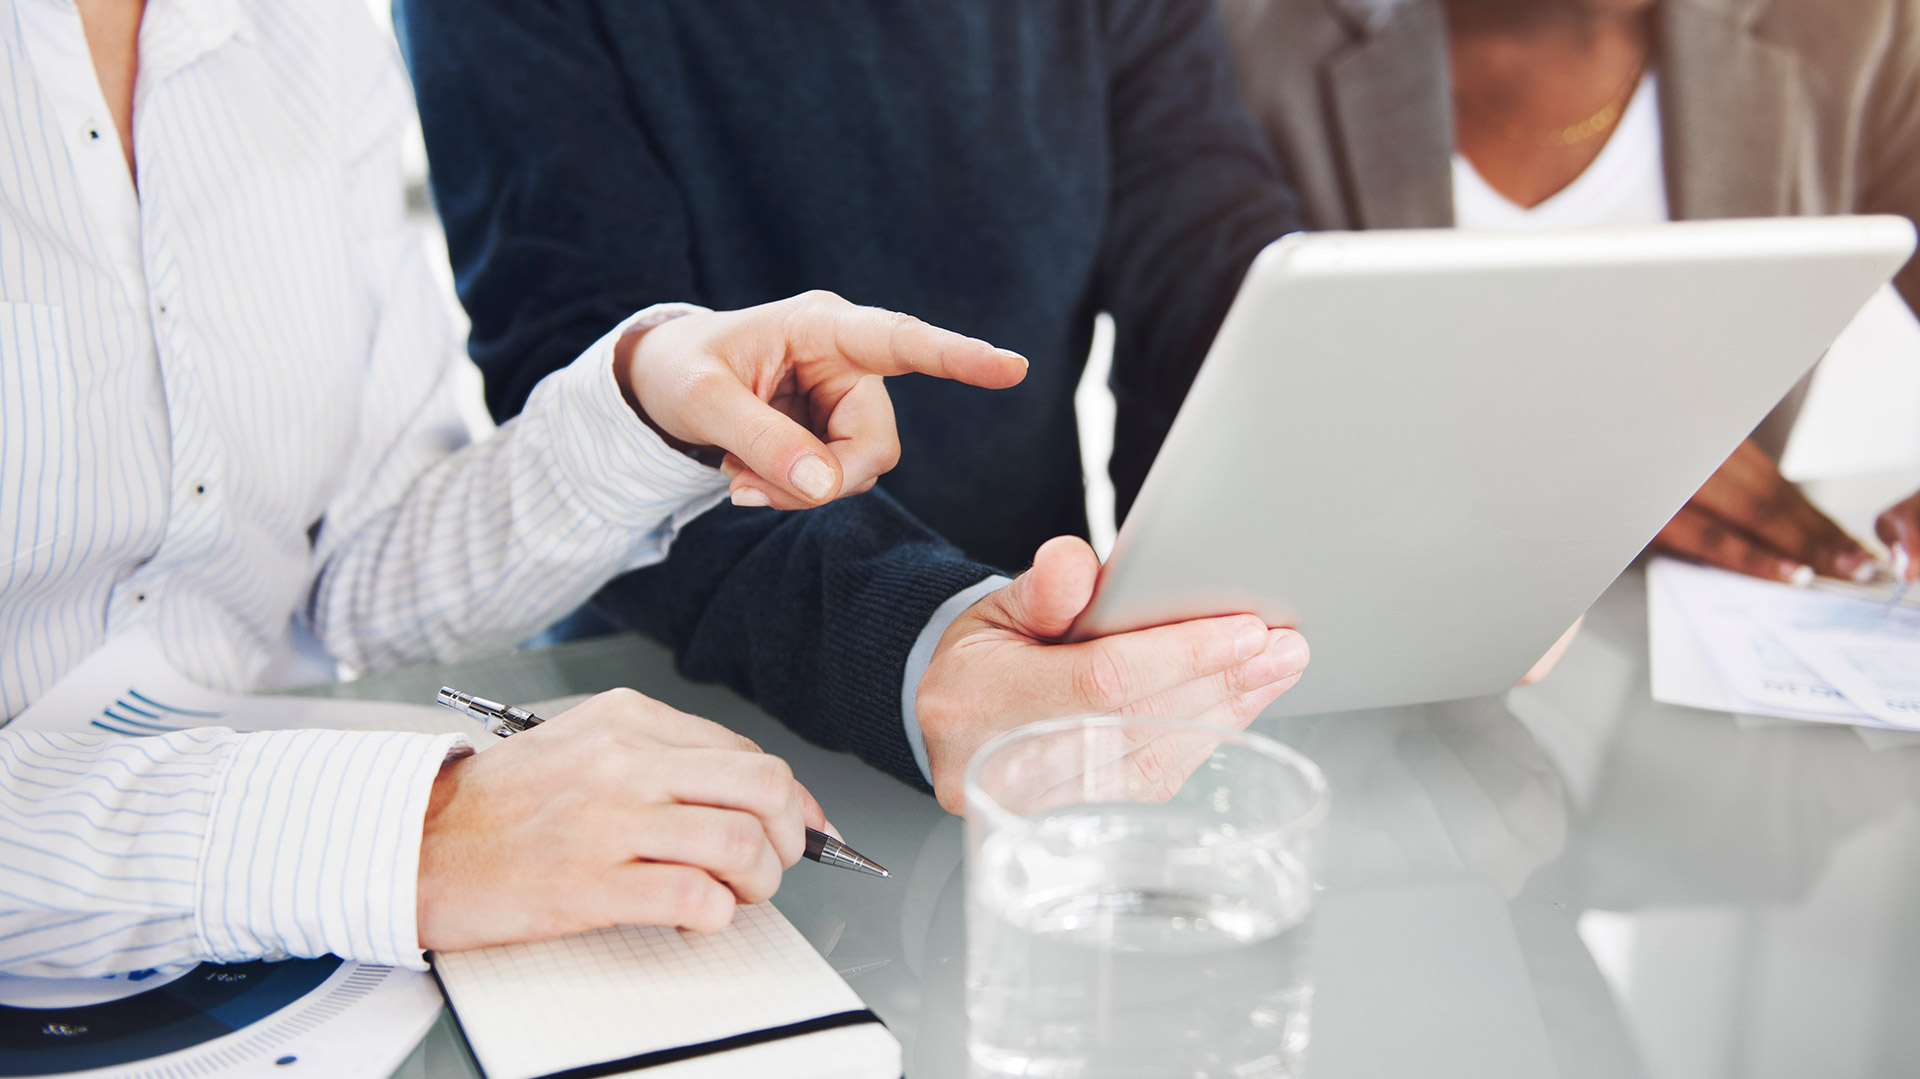 6 elementi indispensabili per una digital strategy efficace